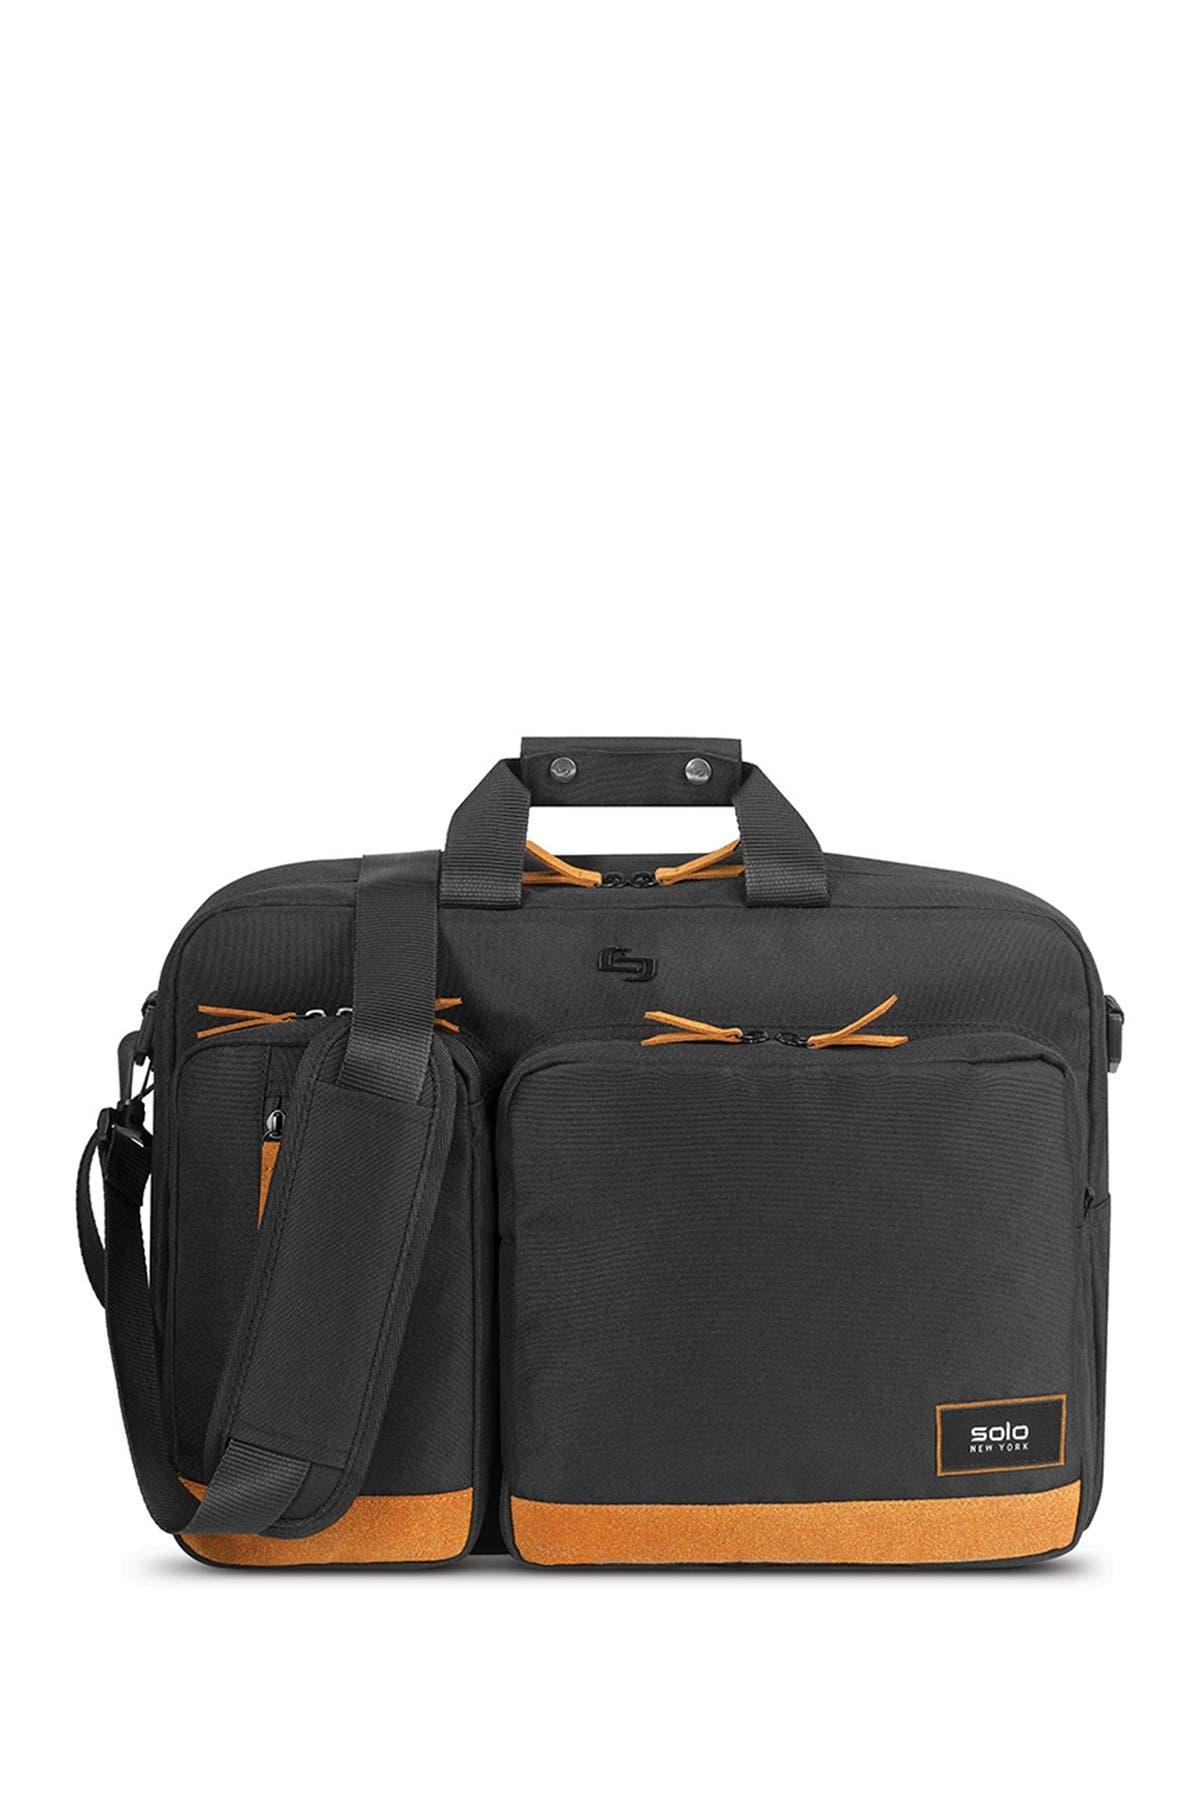 Image of SOLO NEW YORK Solo Duane Hybrid Briefcase